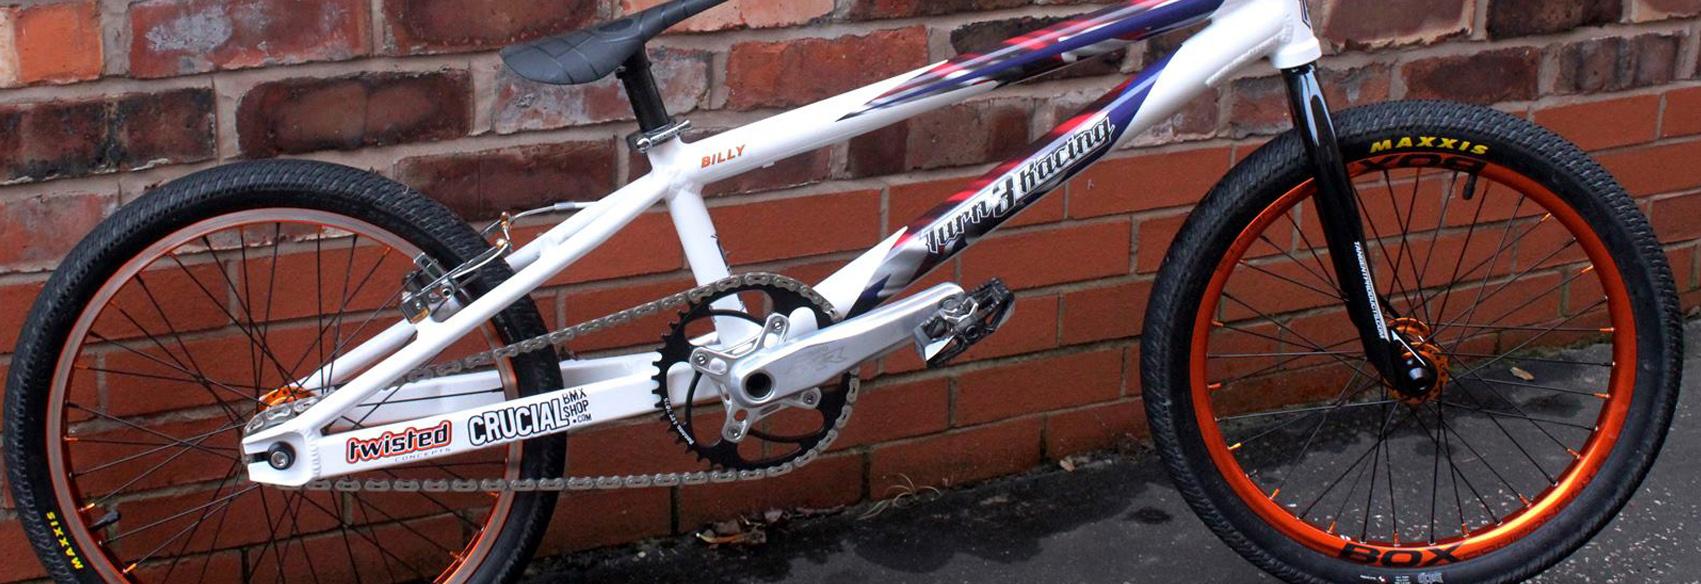 Billy Luckhurst Bike Check Fifteen